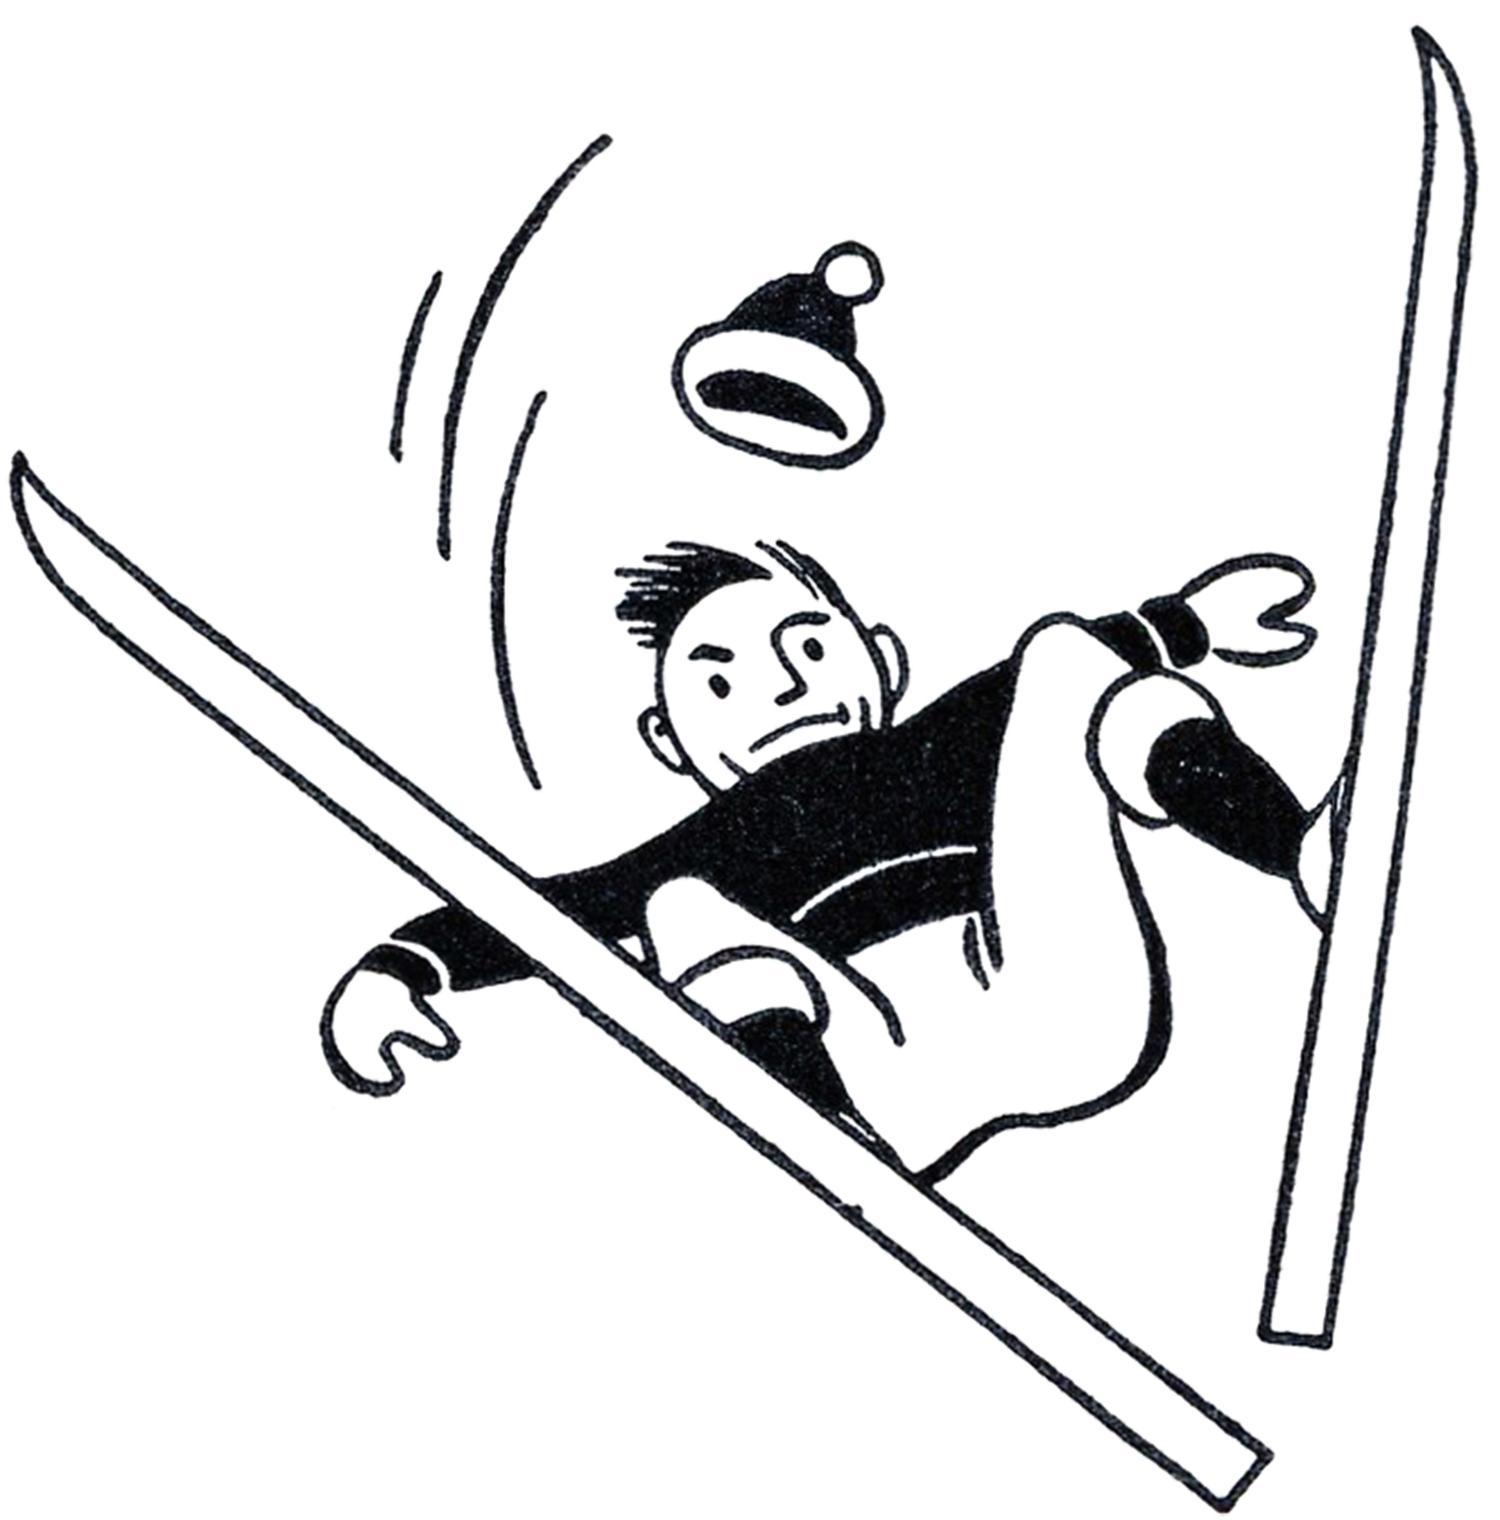 1500x1520 Best Free Ski Clip Art Retro Skiing Clipart Image